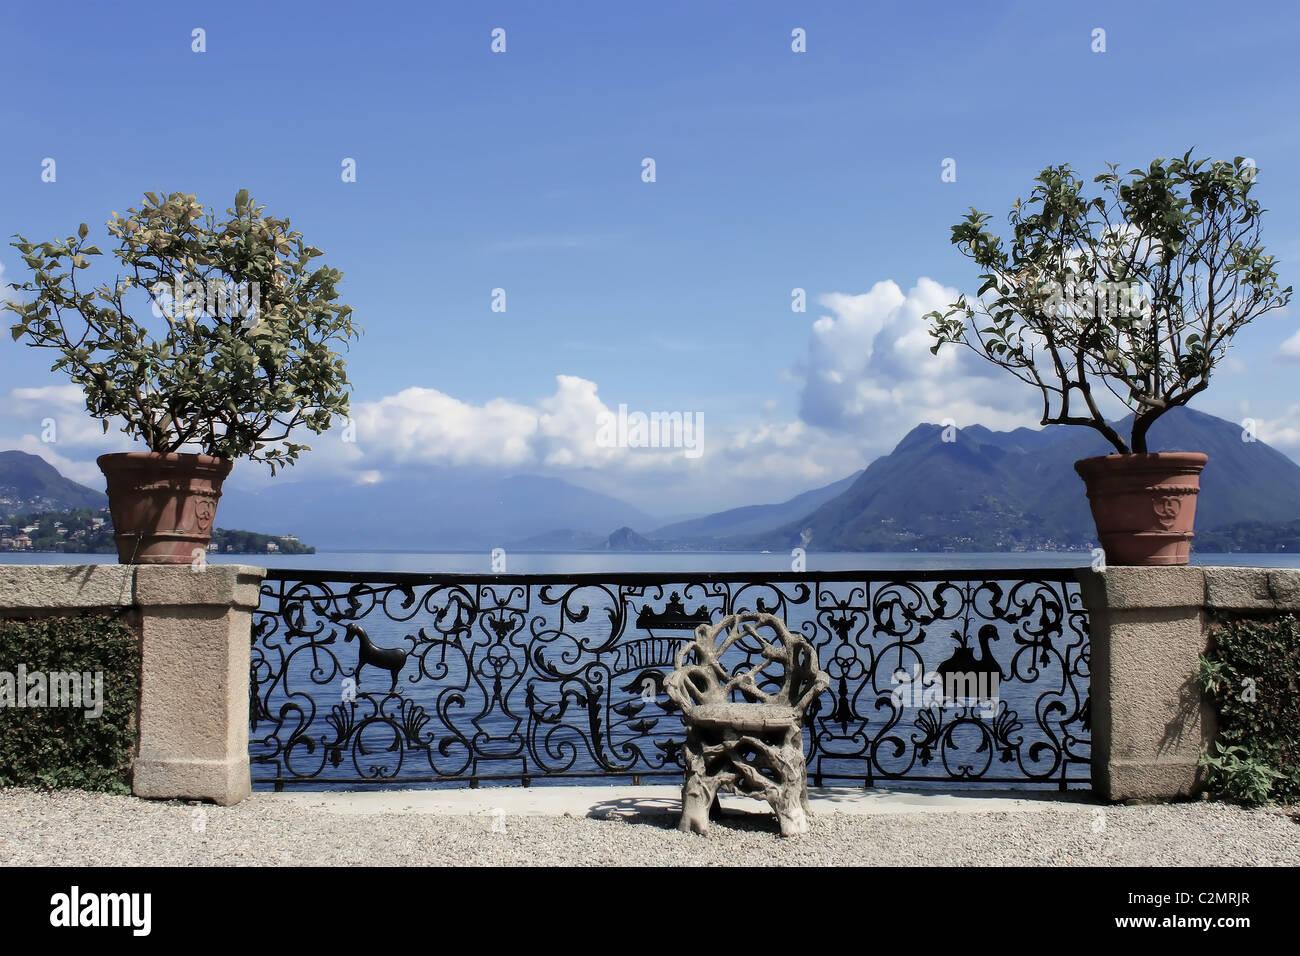 Palazzo Borromeo - Italy - Piemont Stock Photo